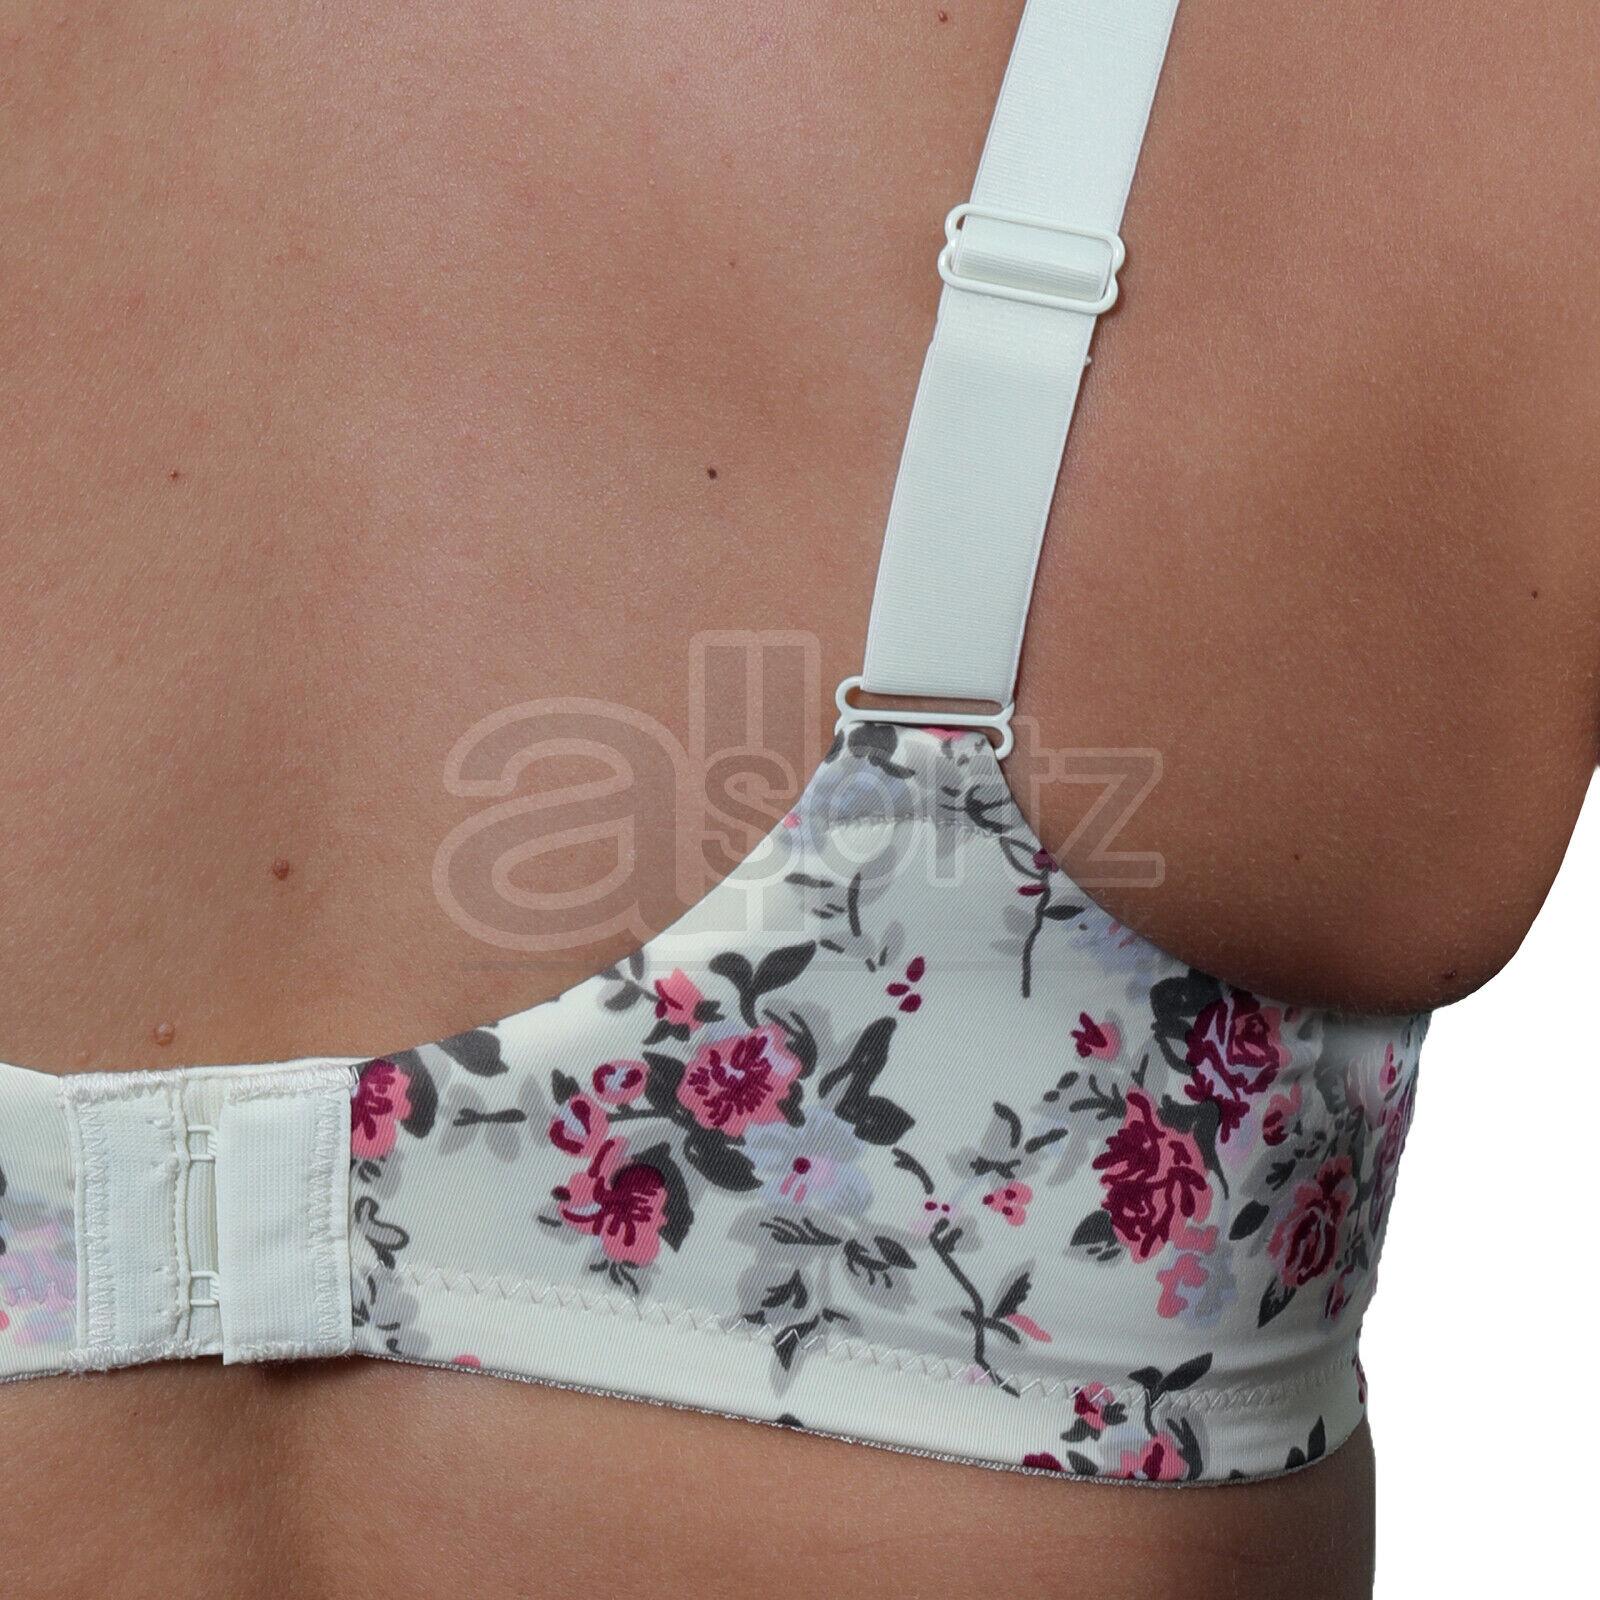 Acousma bra orange multi-brown patchwork bra  In size 34c 32c 36d 38d 40d